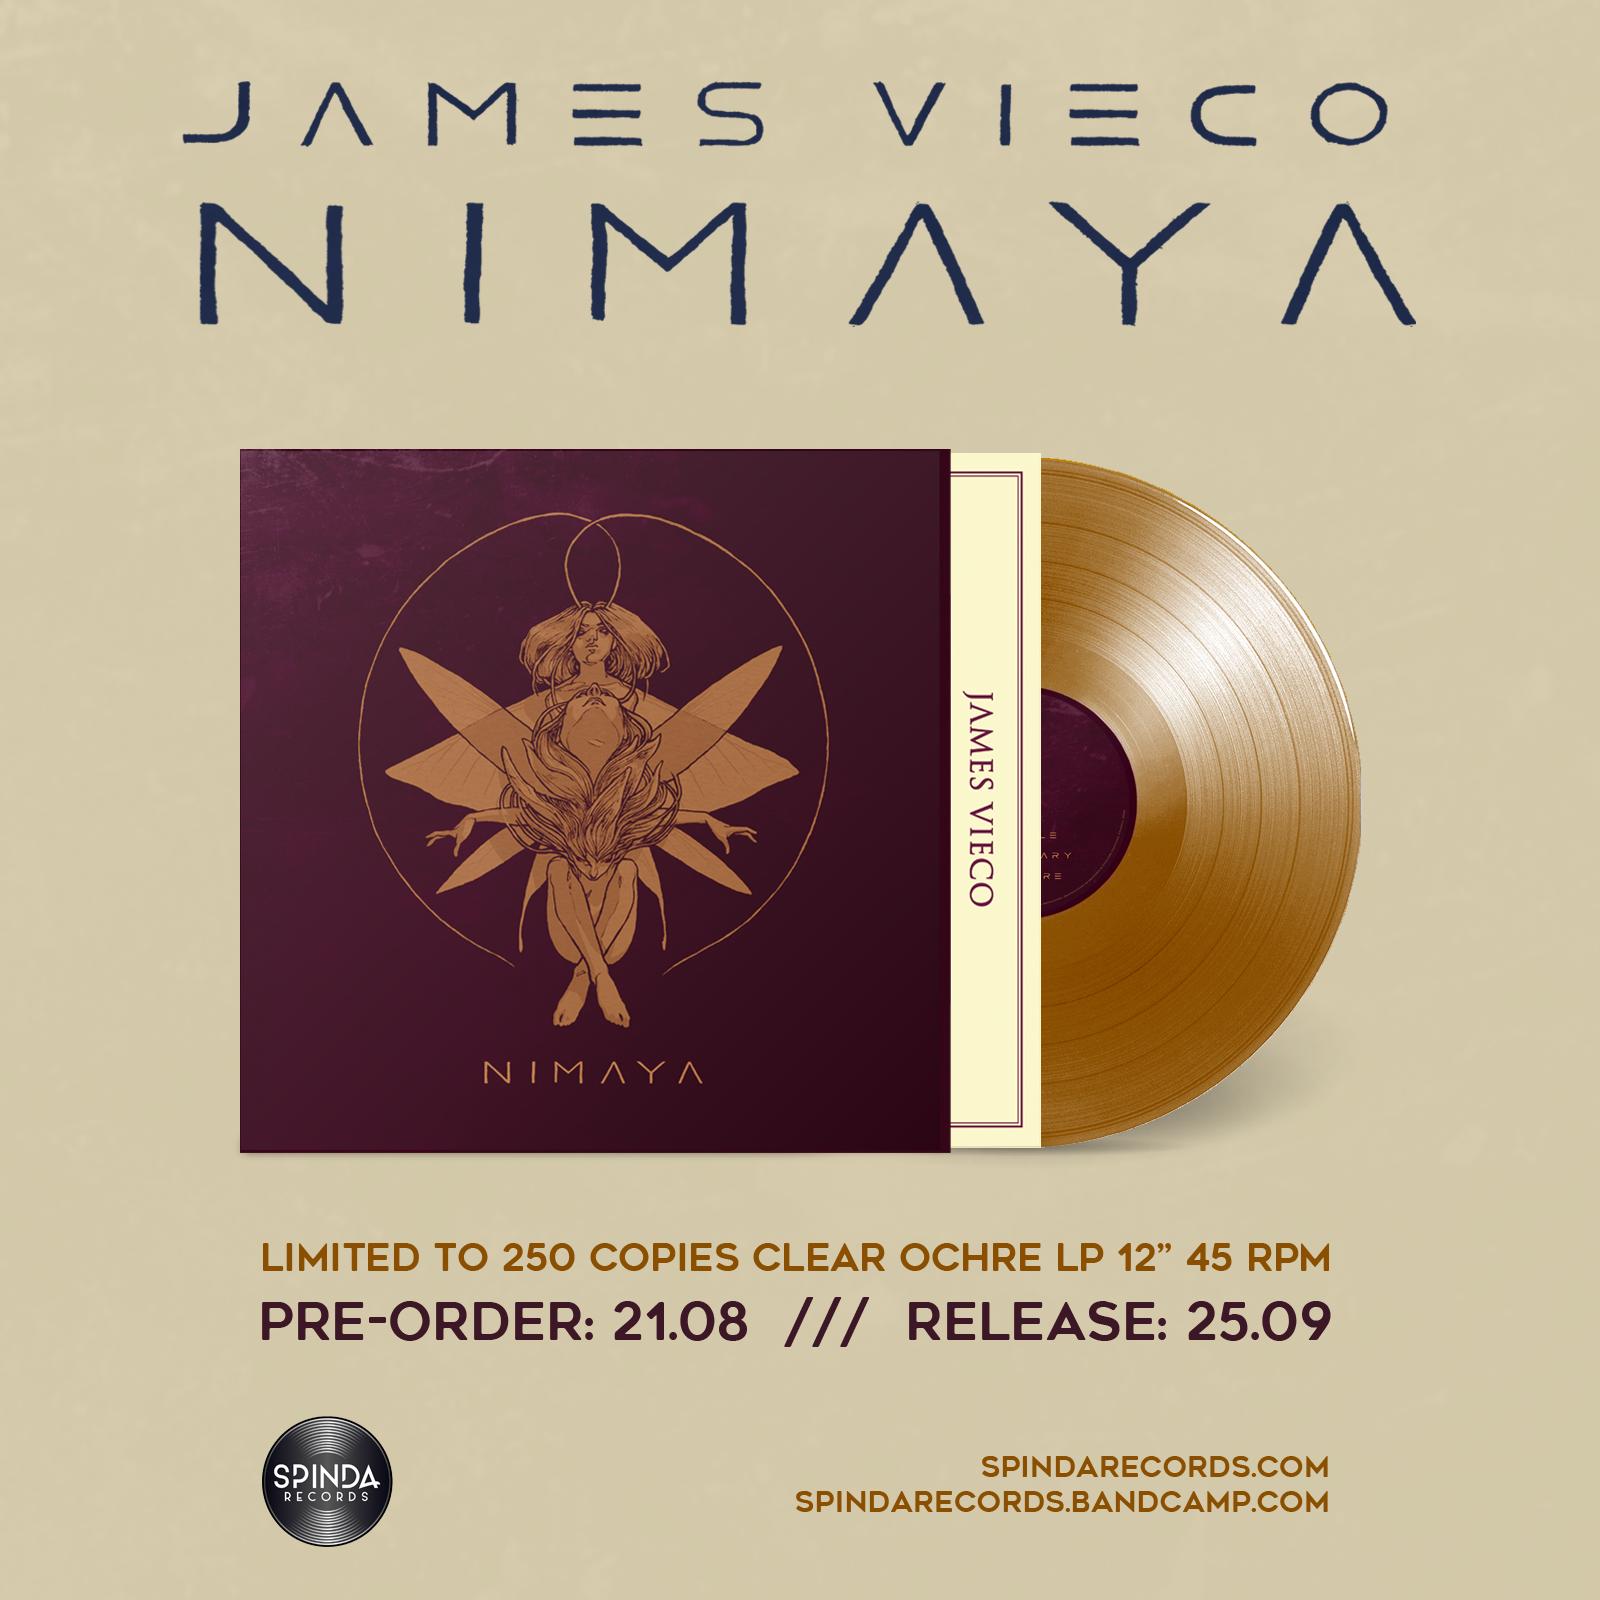 James Vieco Nimaya